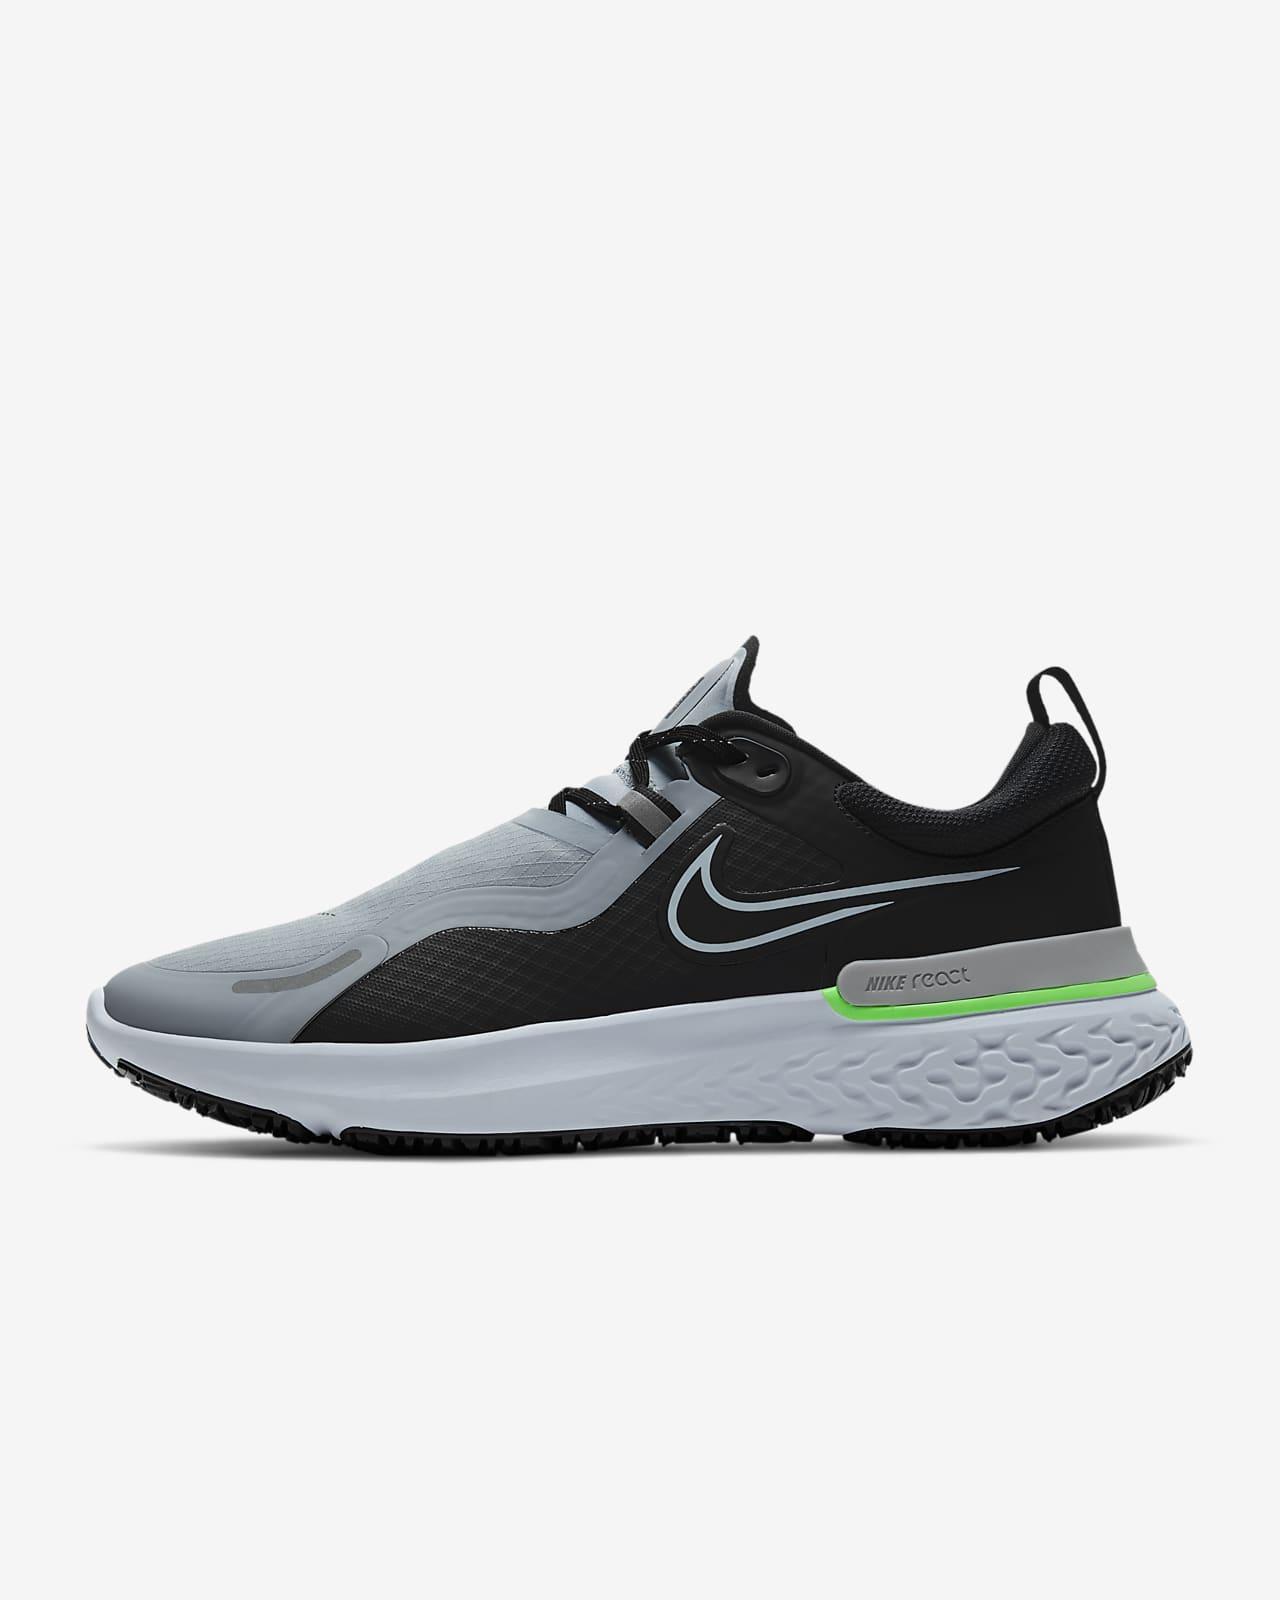 Chaussure de running Nike React Miler Shield pour Homme